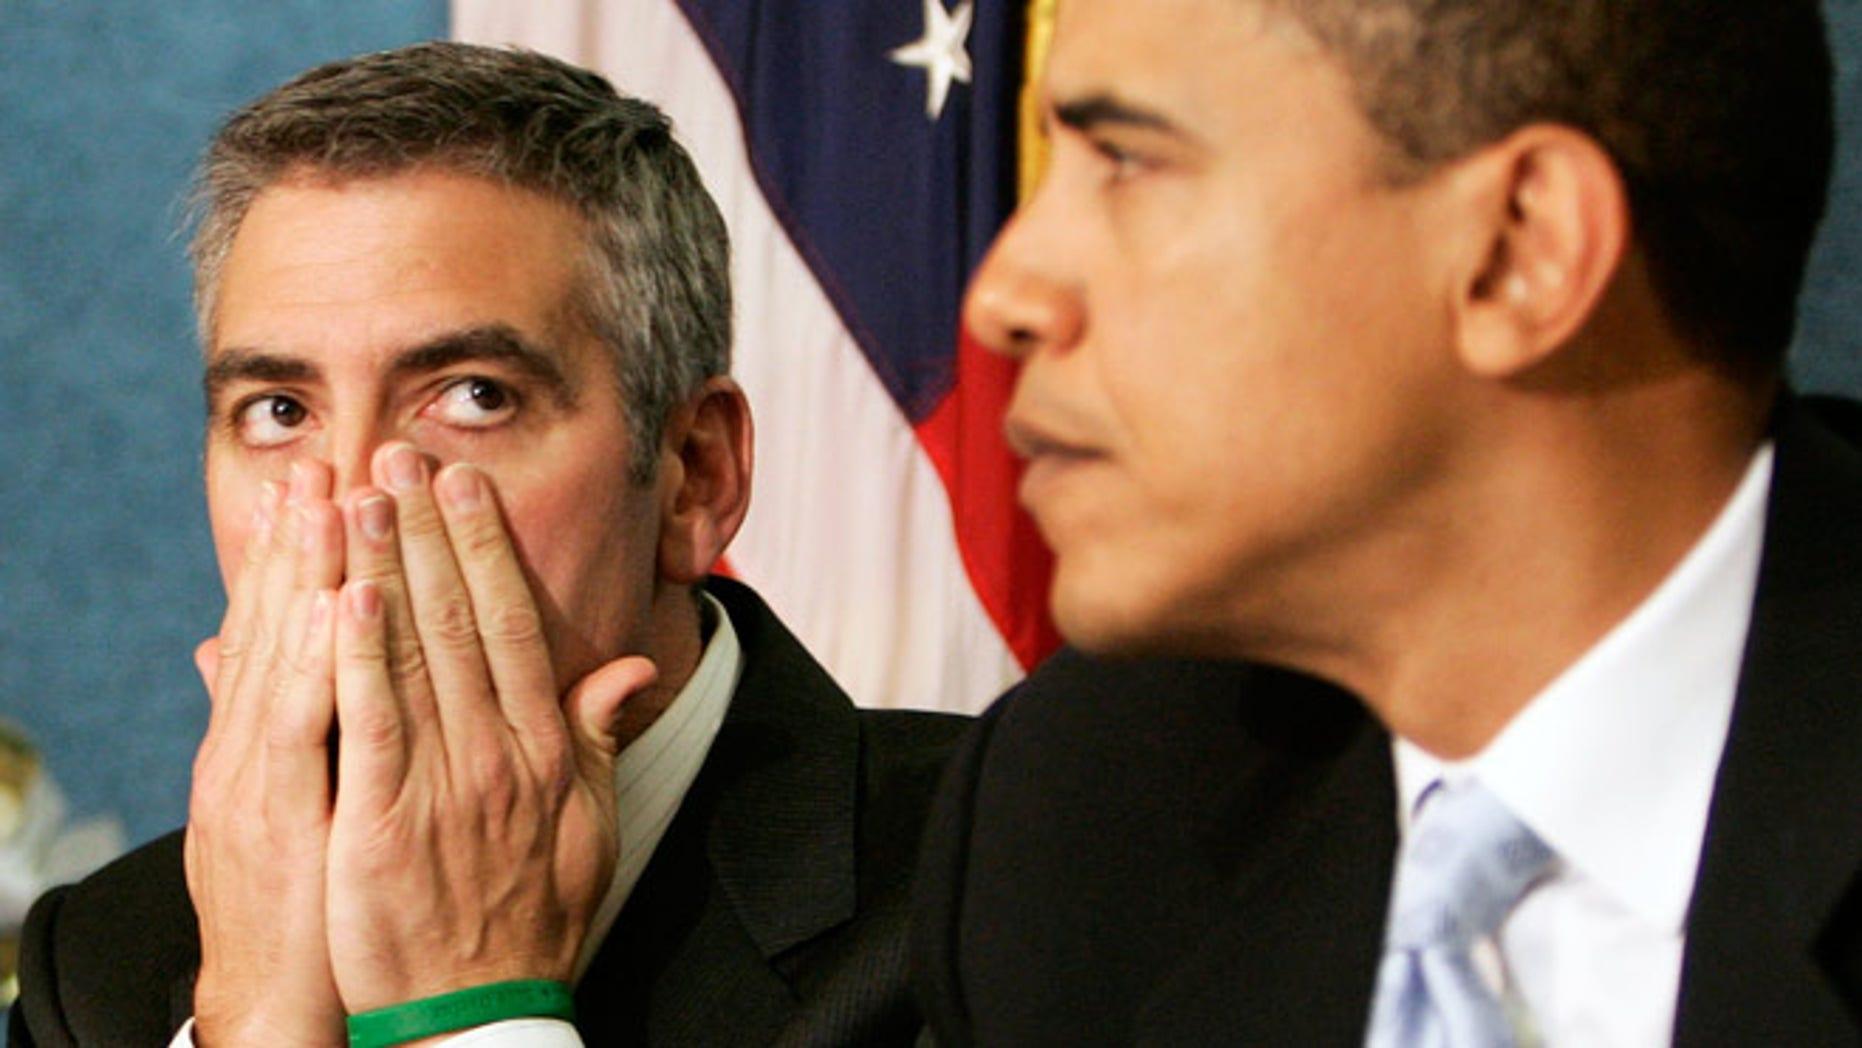 George Clooney with then Senator Barack Obama in 2006.